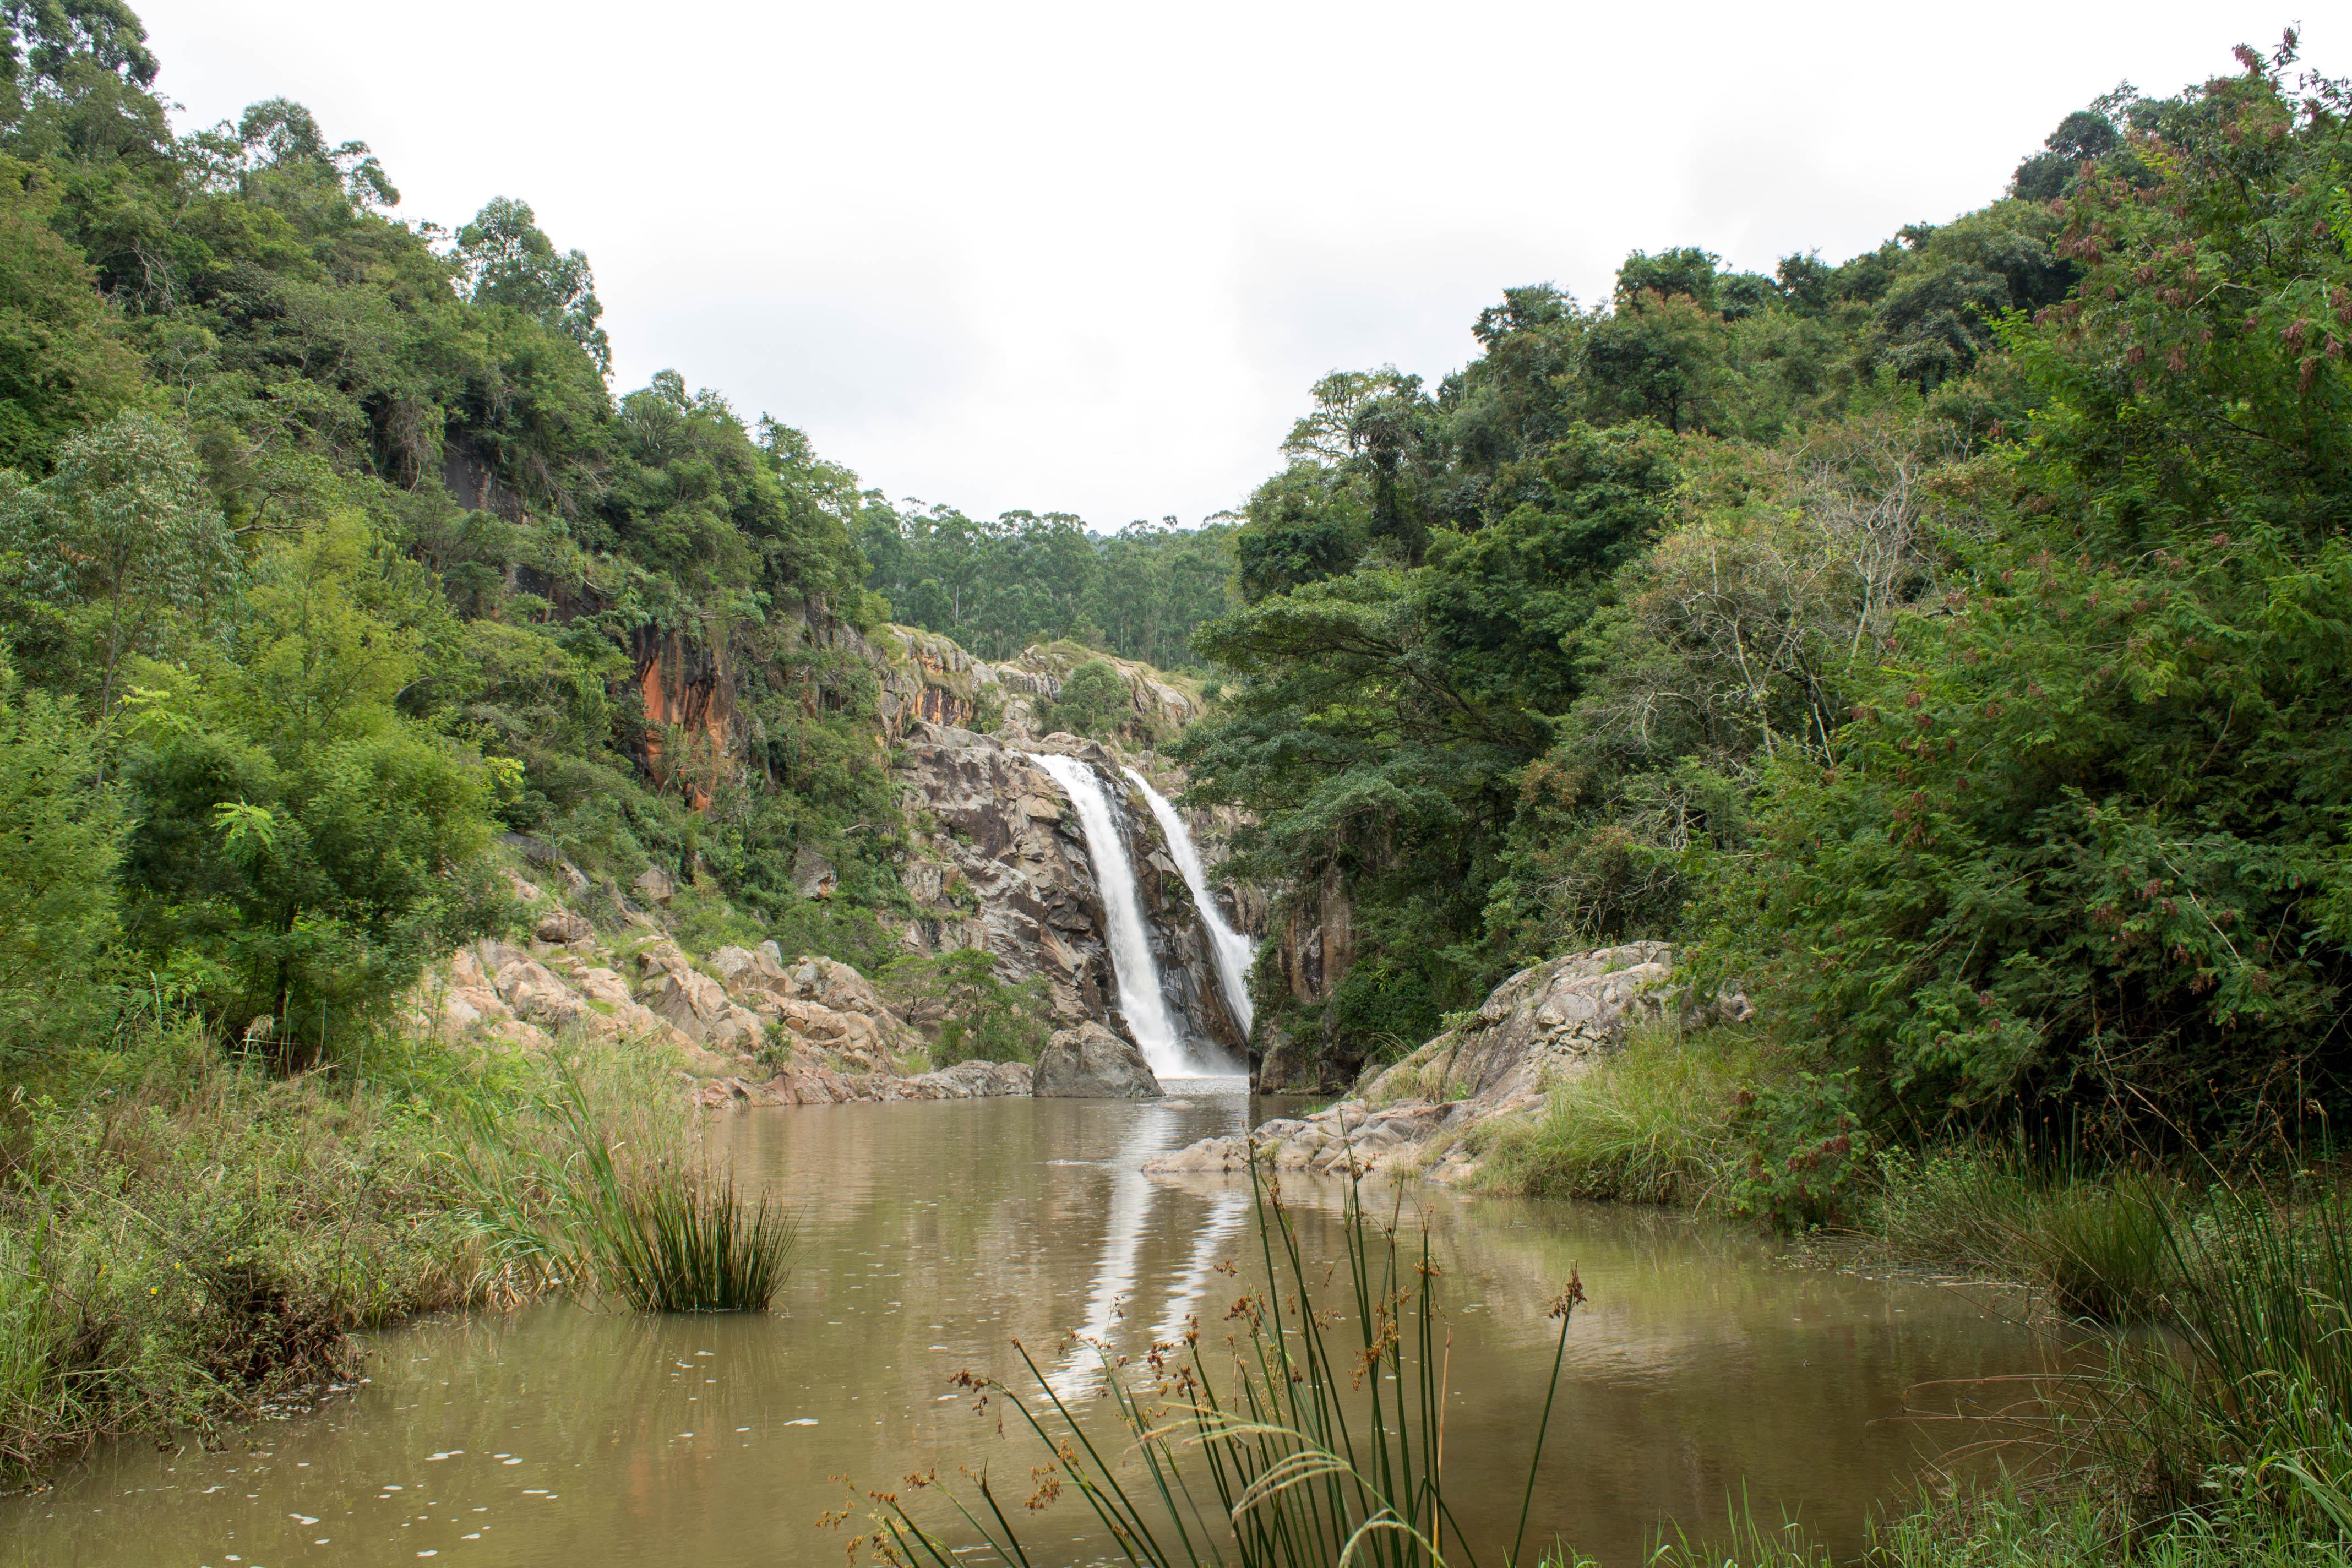 Cascada Mantenga